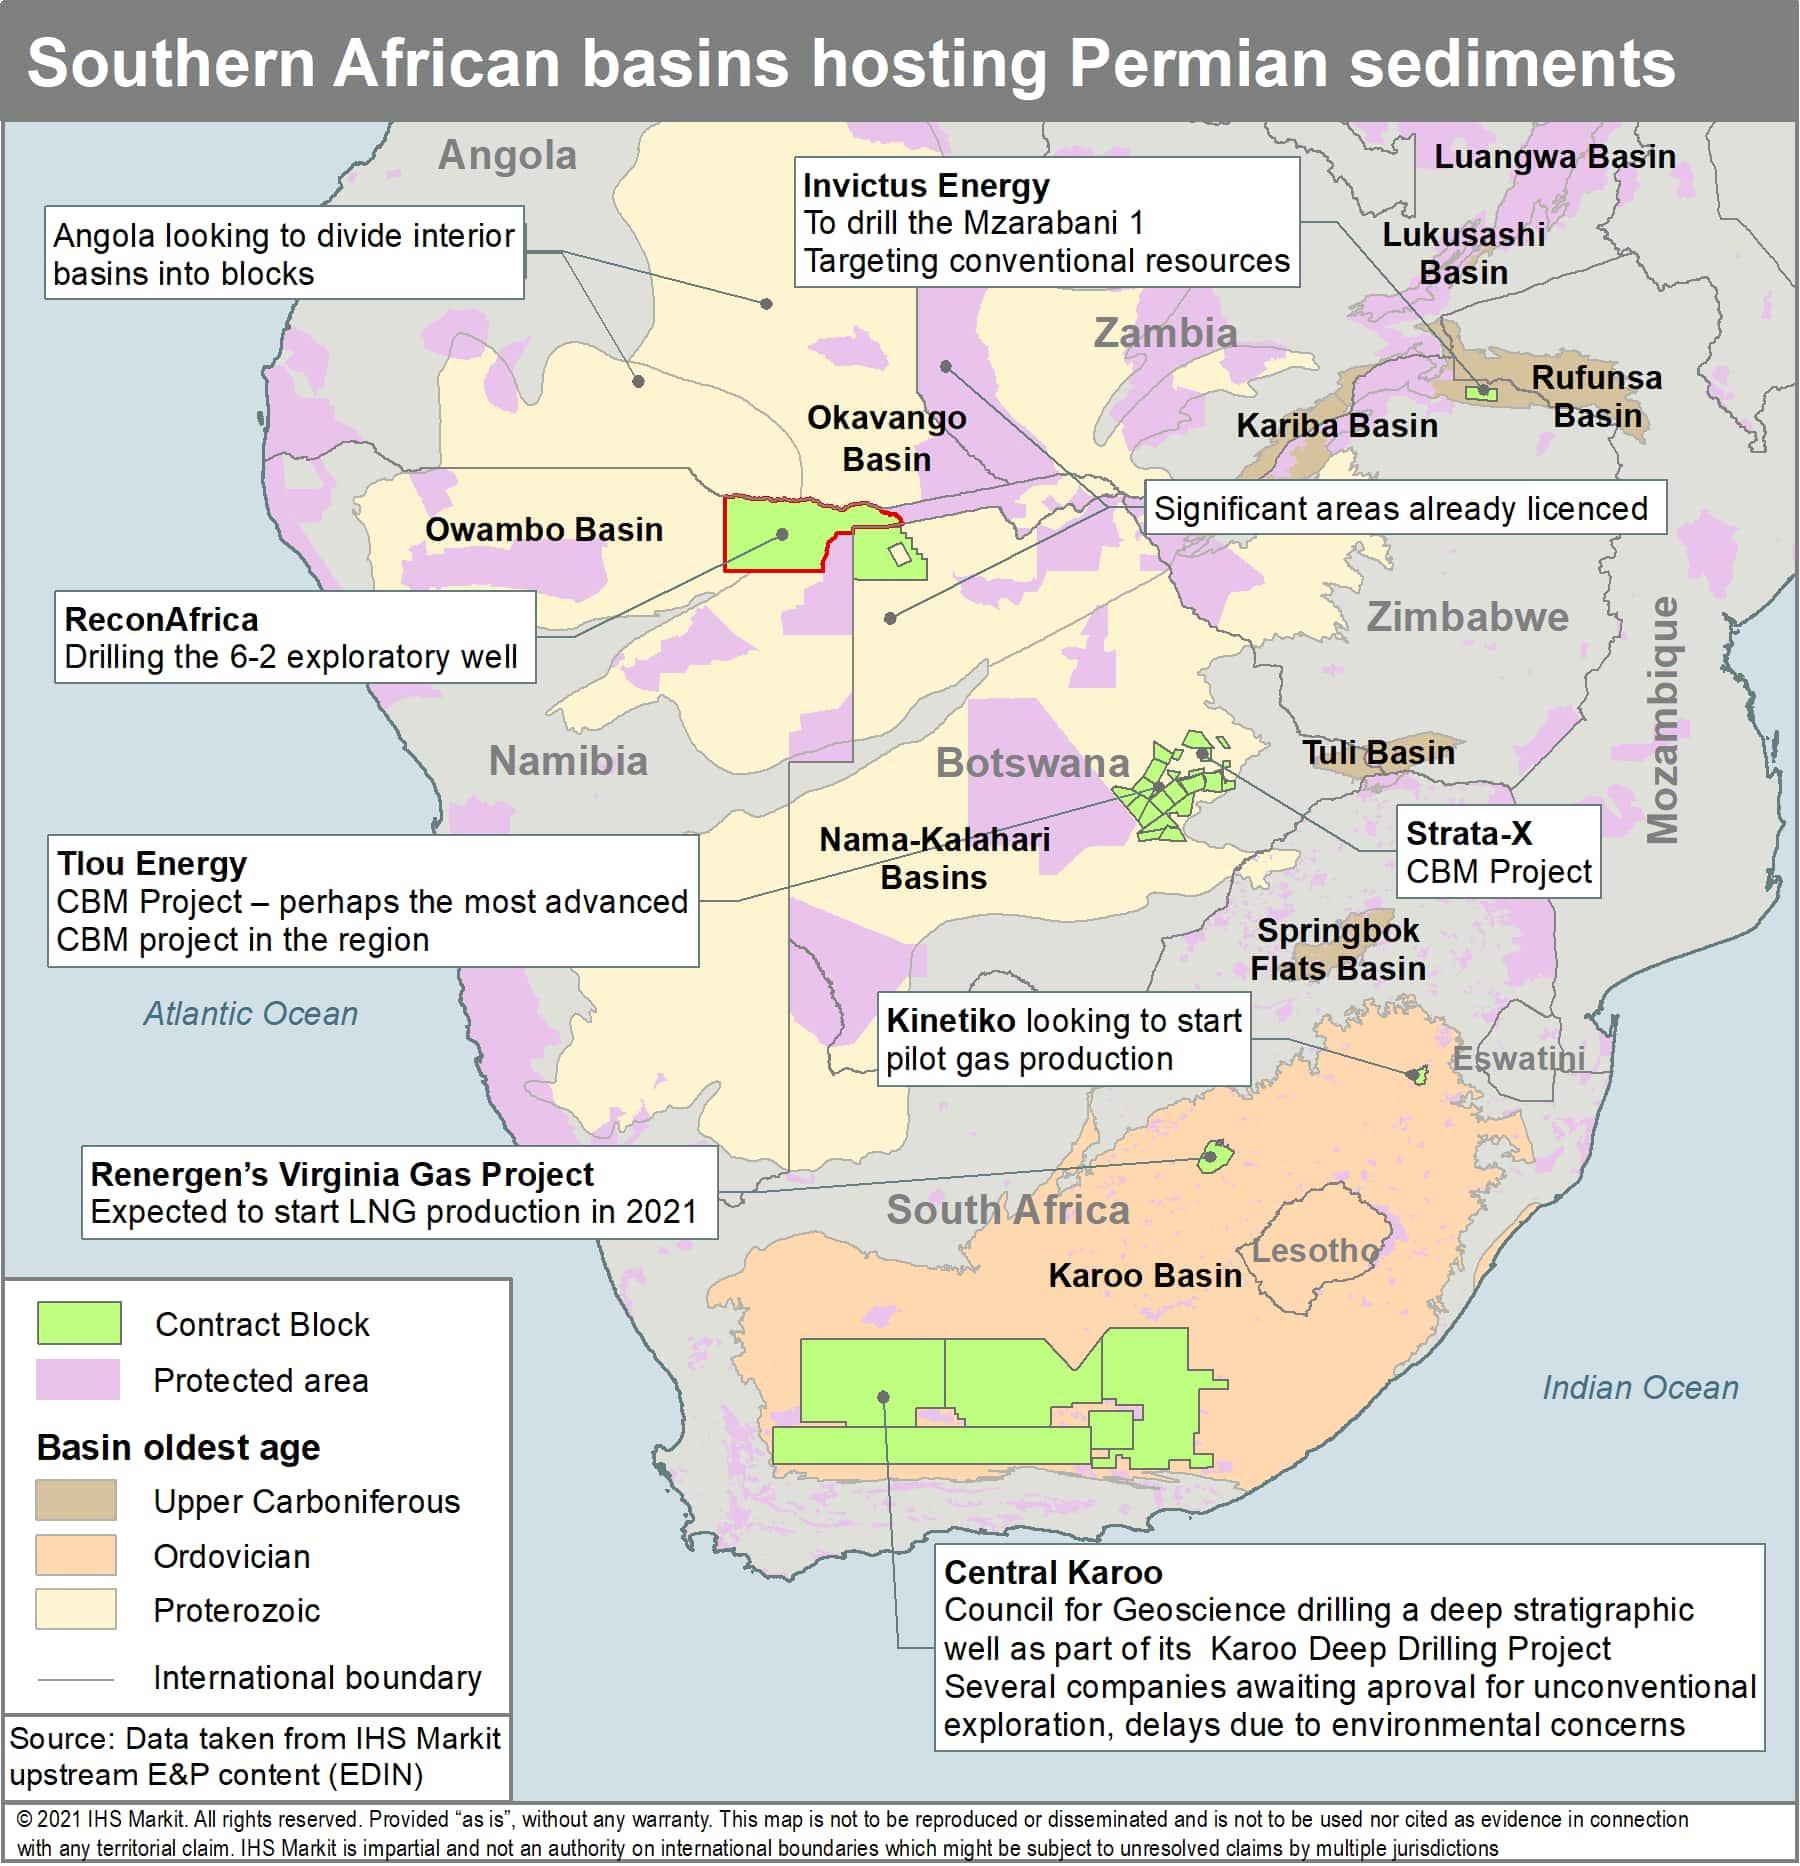 southern africa basins